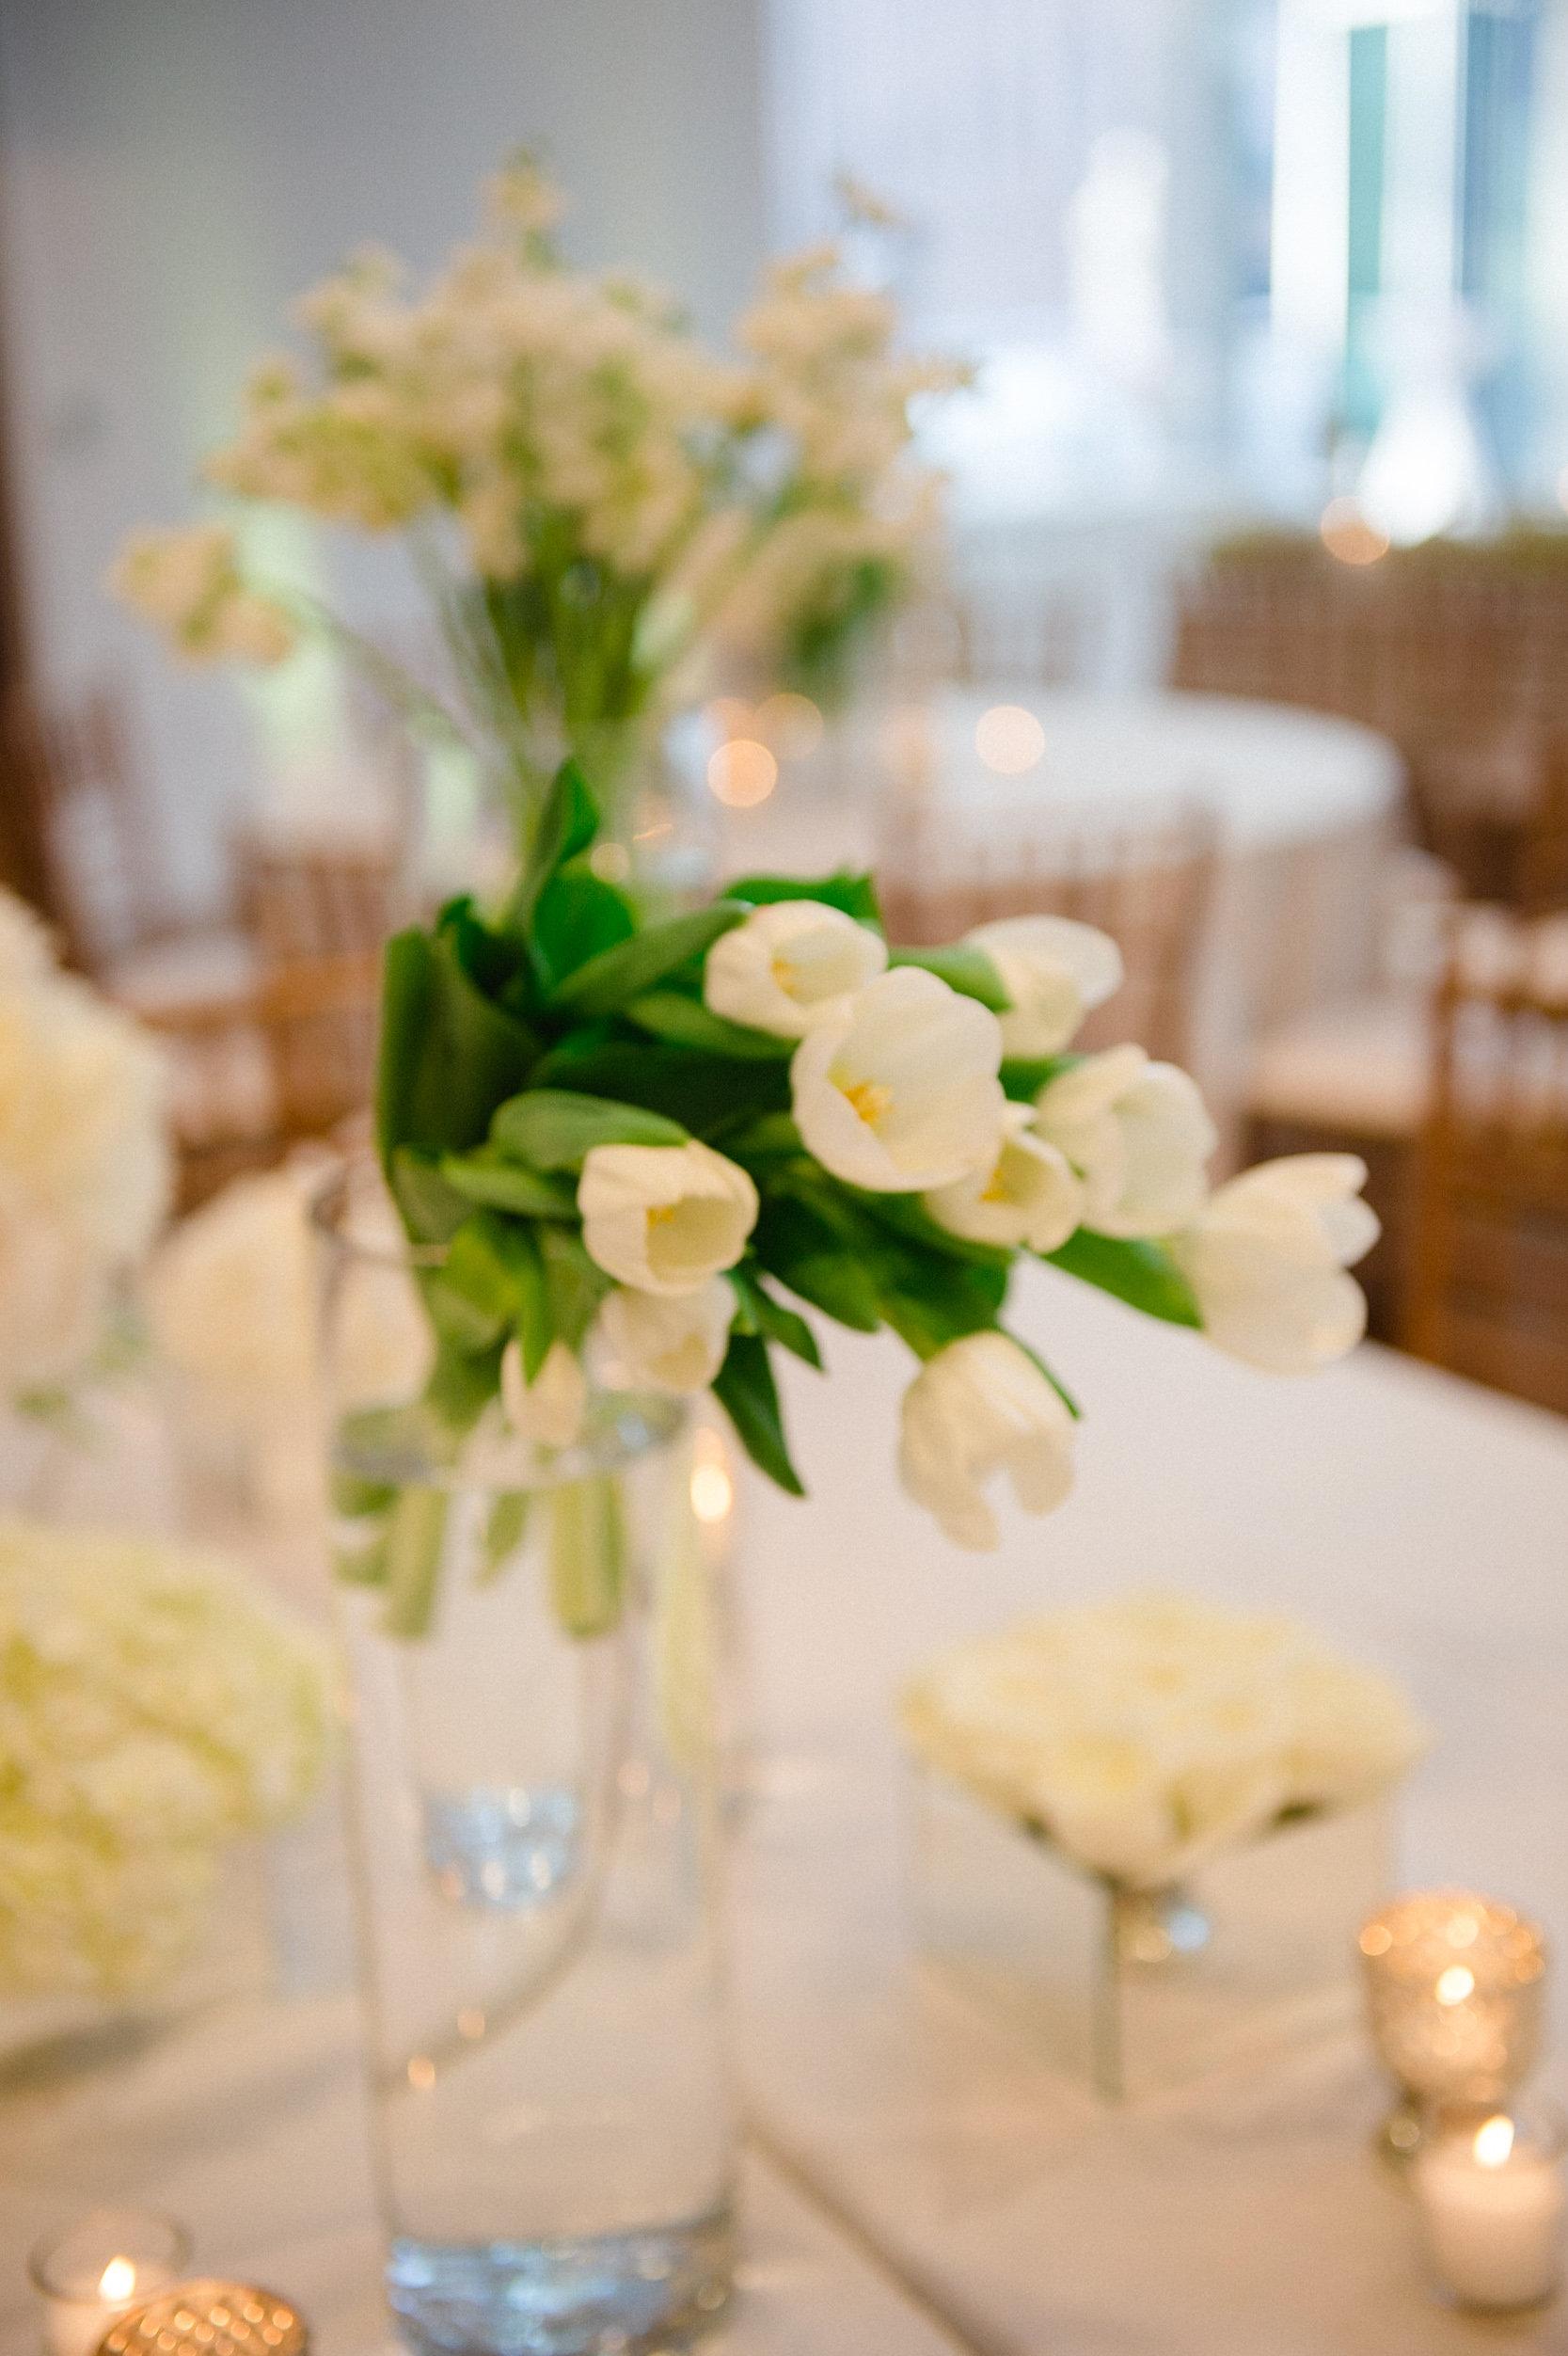 shelby&jordan|smitten&hooked|wedding|details-106.jpg